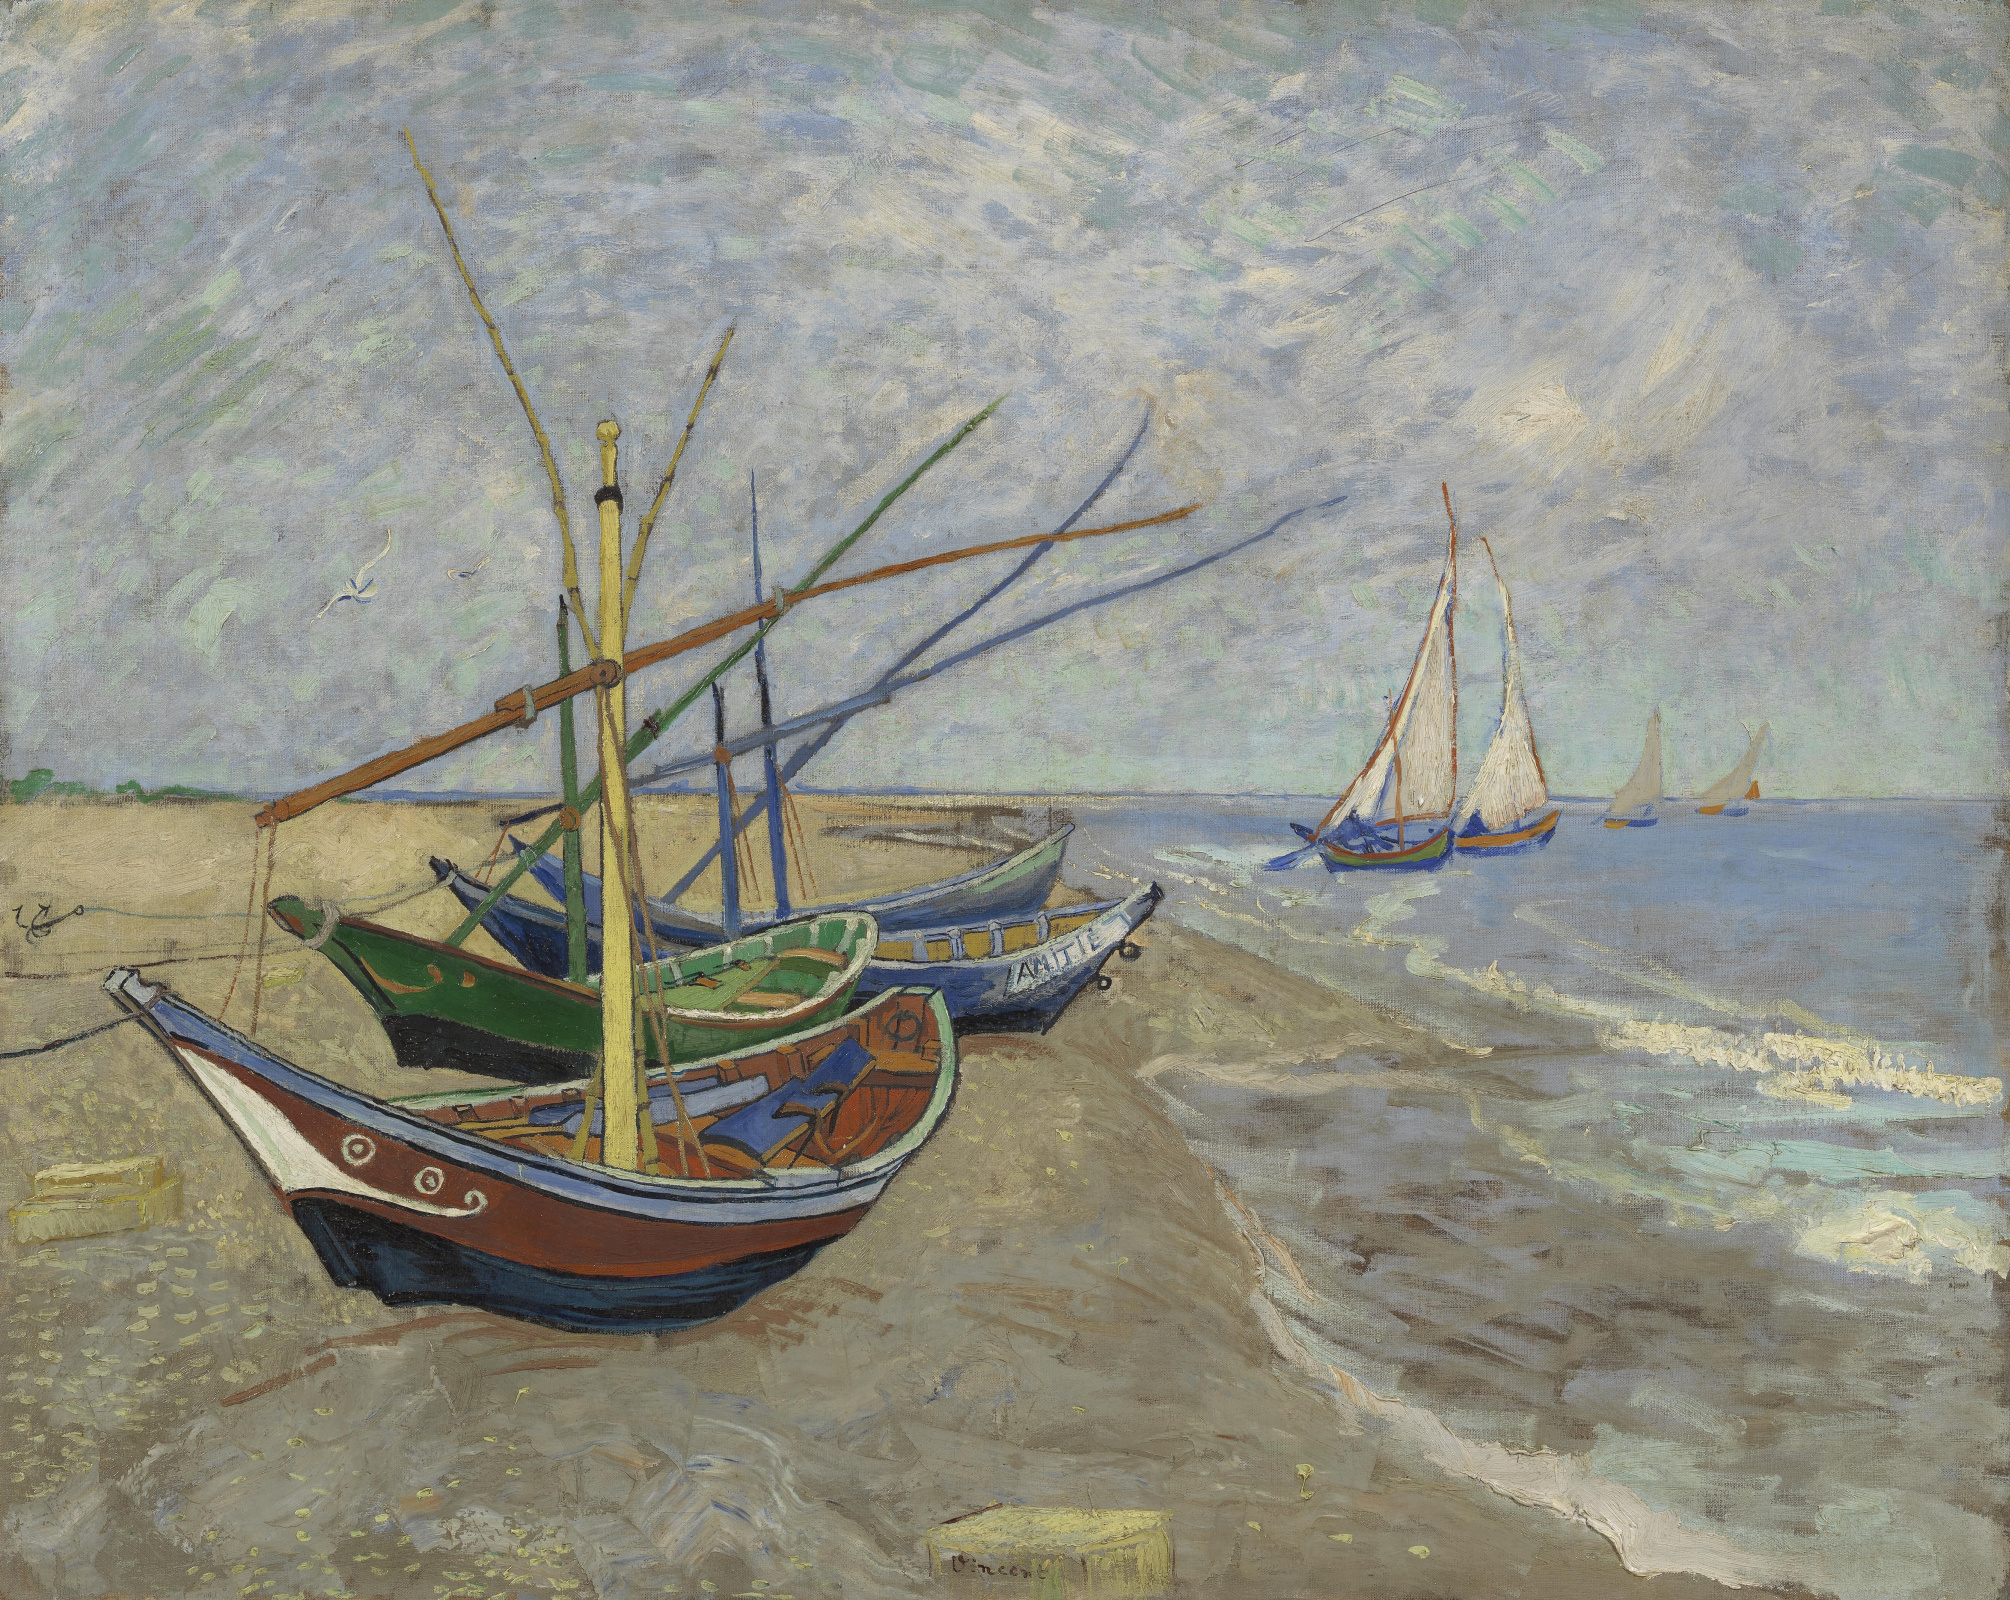 Винсент Ван Гог. Рыбацкие лодки на берегу у Сент Мари де ля Мер